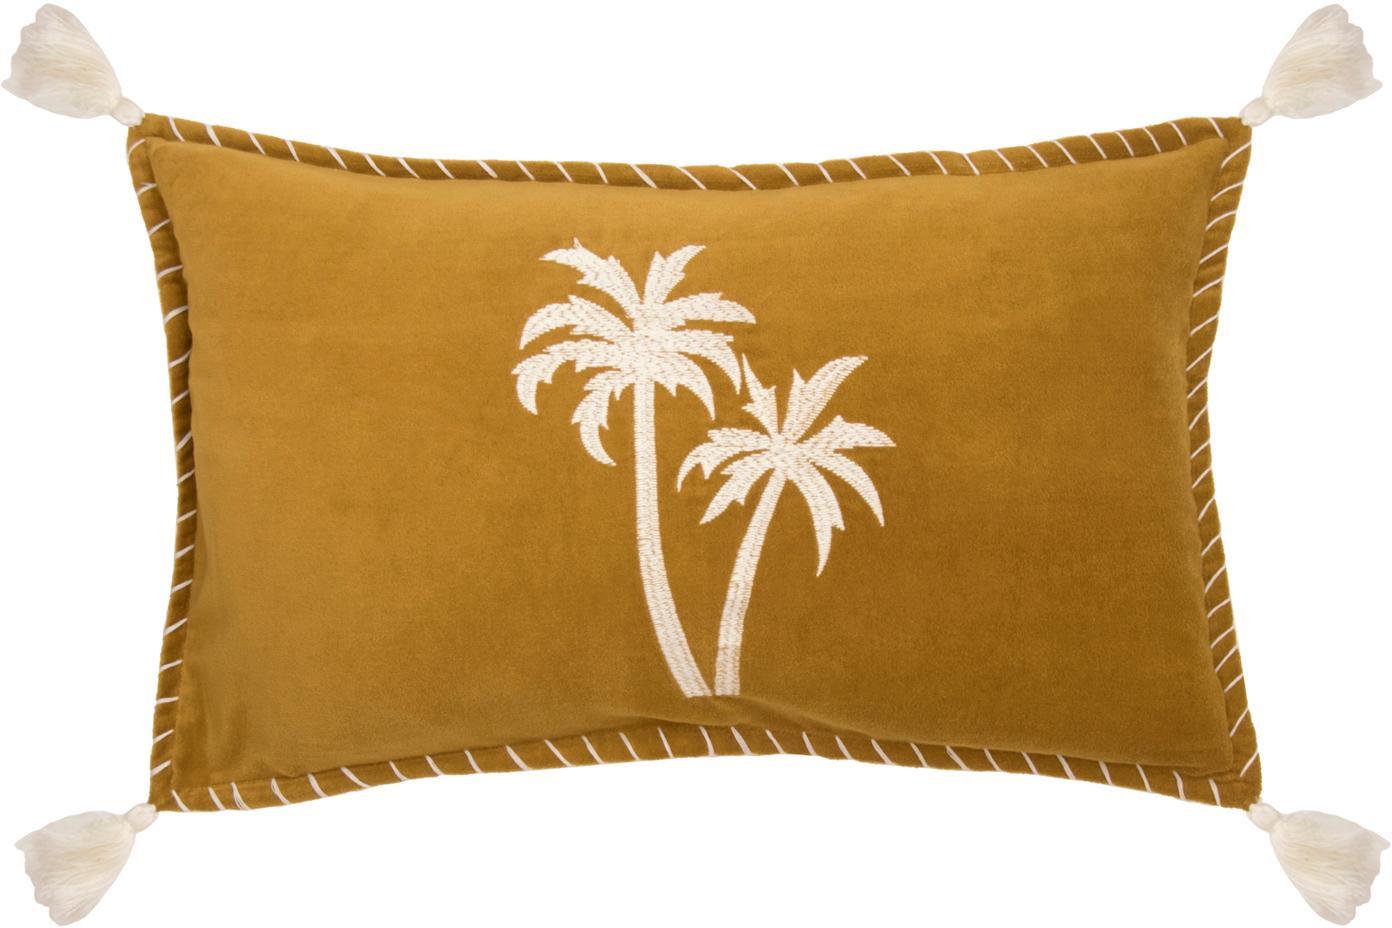 Funda de cojín bordado con borlas Bali, 50%poliéster, 50%algodón, Mostaza, blanco, An 30 x L 50 cm